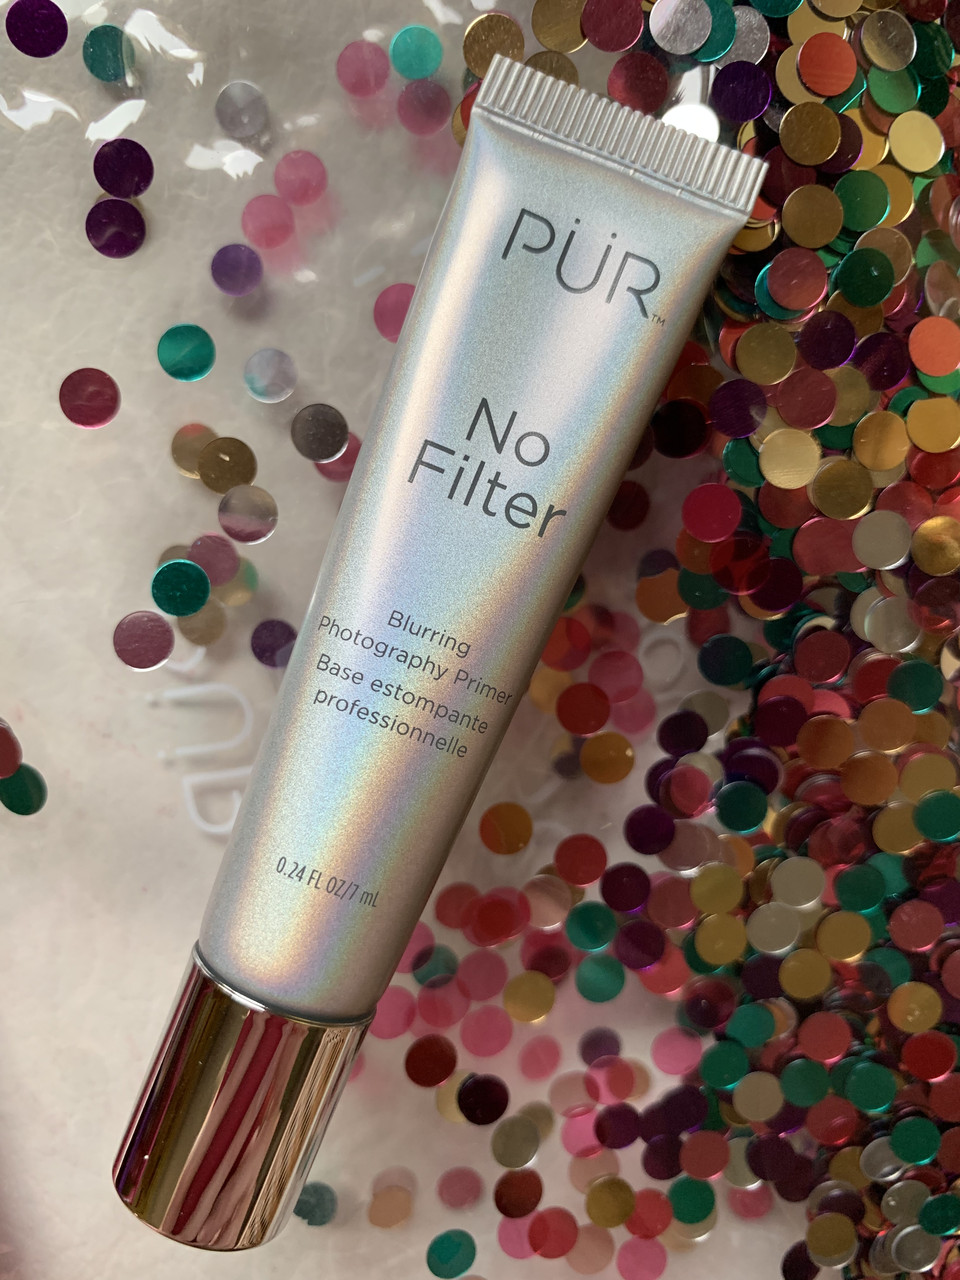 Праймер под макияж PUR No Filter Blurring Photography Primer